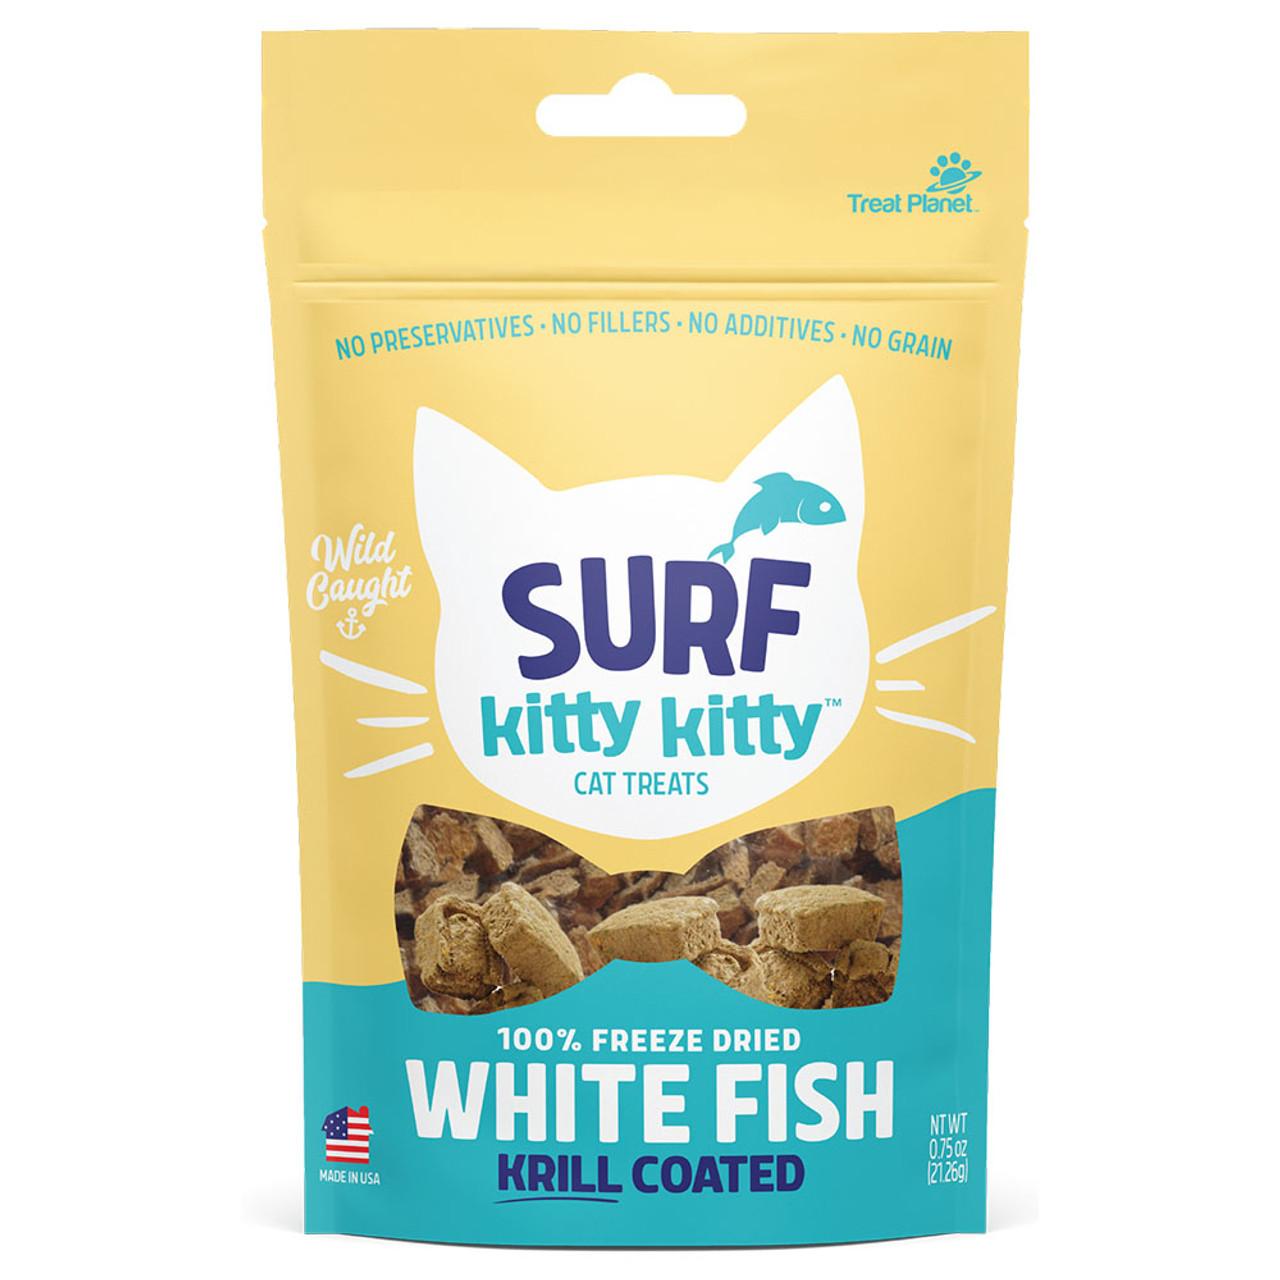 Surf Kitty Kitty White Fish Krill Coated Freeze Dried Cat Treats